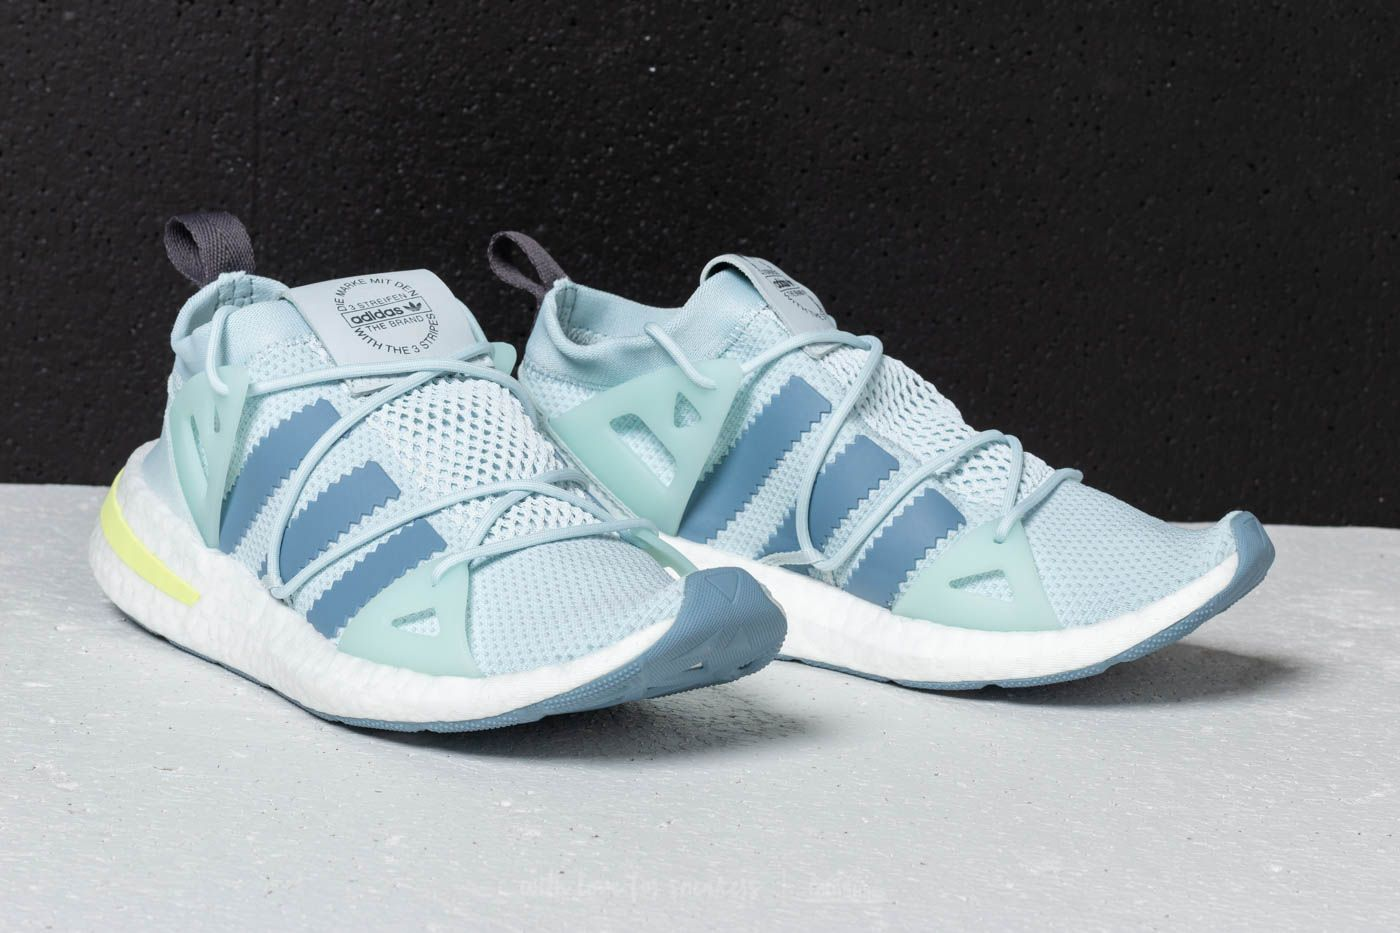 check out 1c900 7c7f5 adidas Arkyn Woman Blue Tint Raw Grey  Grey  160  blue adidas arkyn  boost sneakers